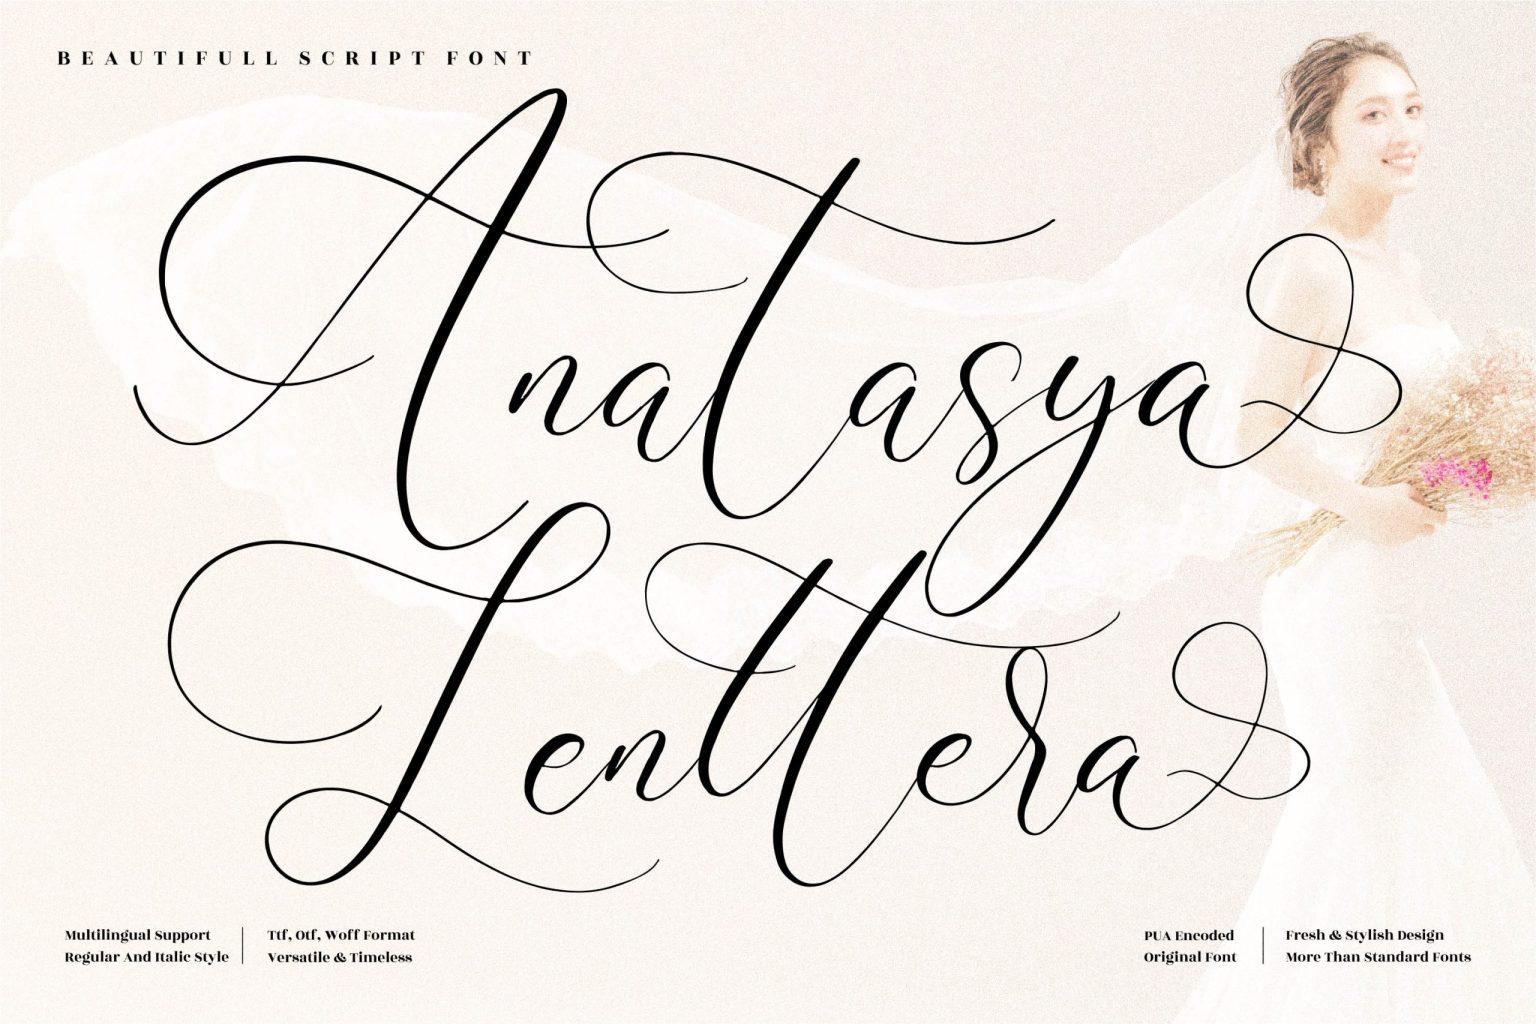 Anatasya Lenttera Calligraphy Font